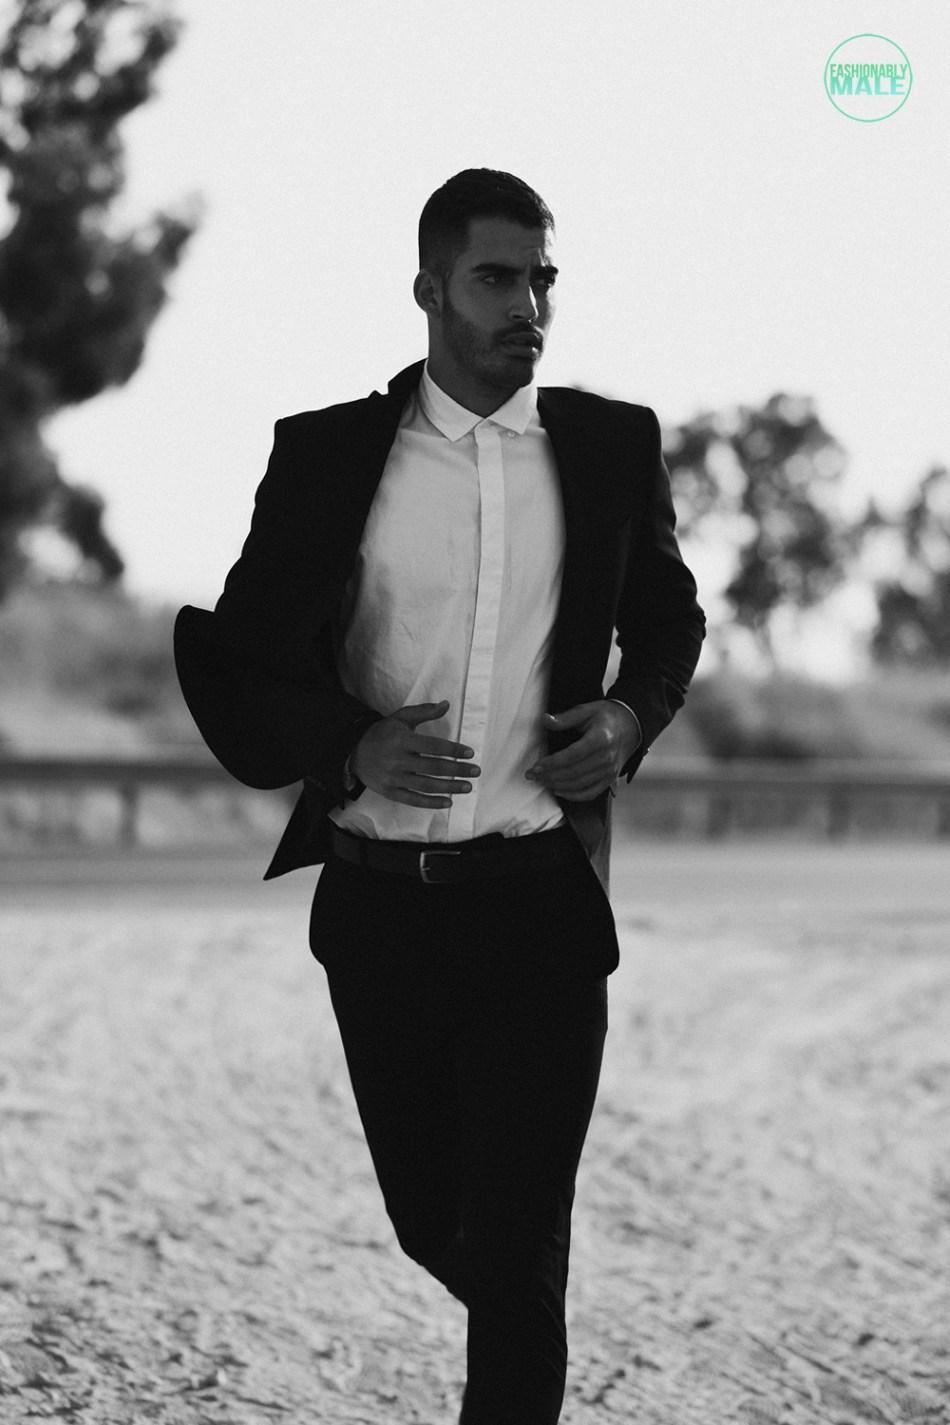 Chen Jerbi by Eran Levi for Fashionably Male2